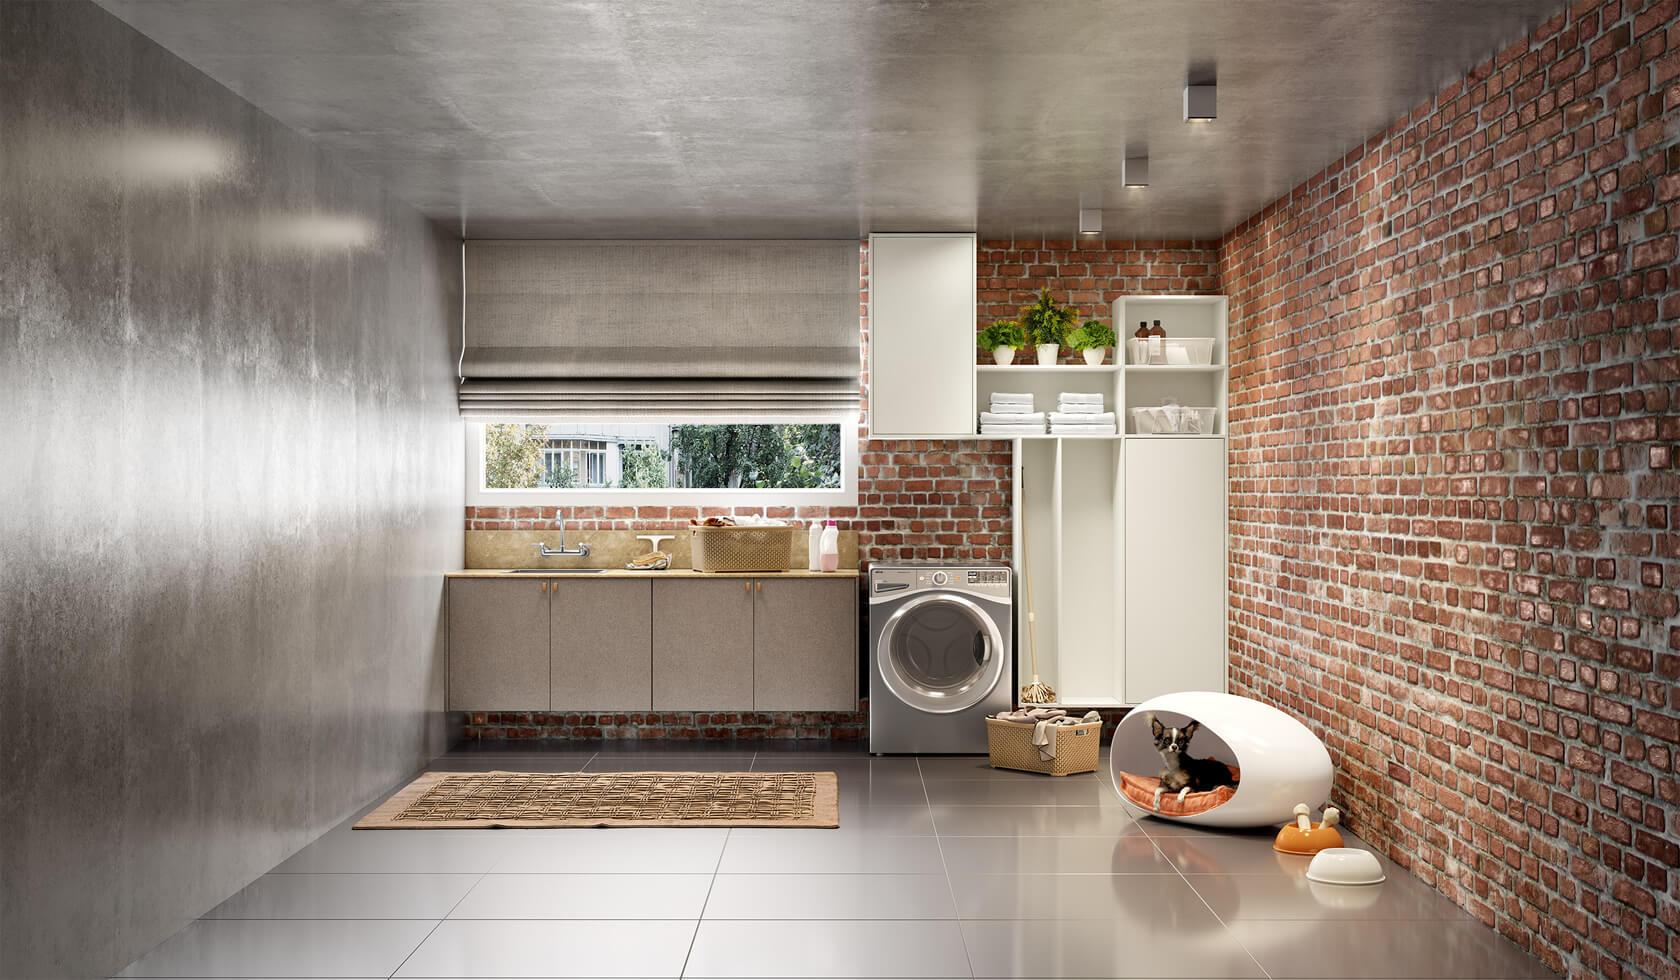 lavanderia e espaço pet rustico industrial